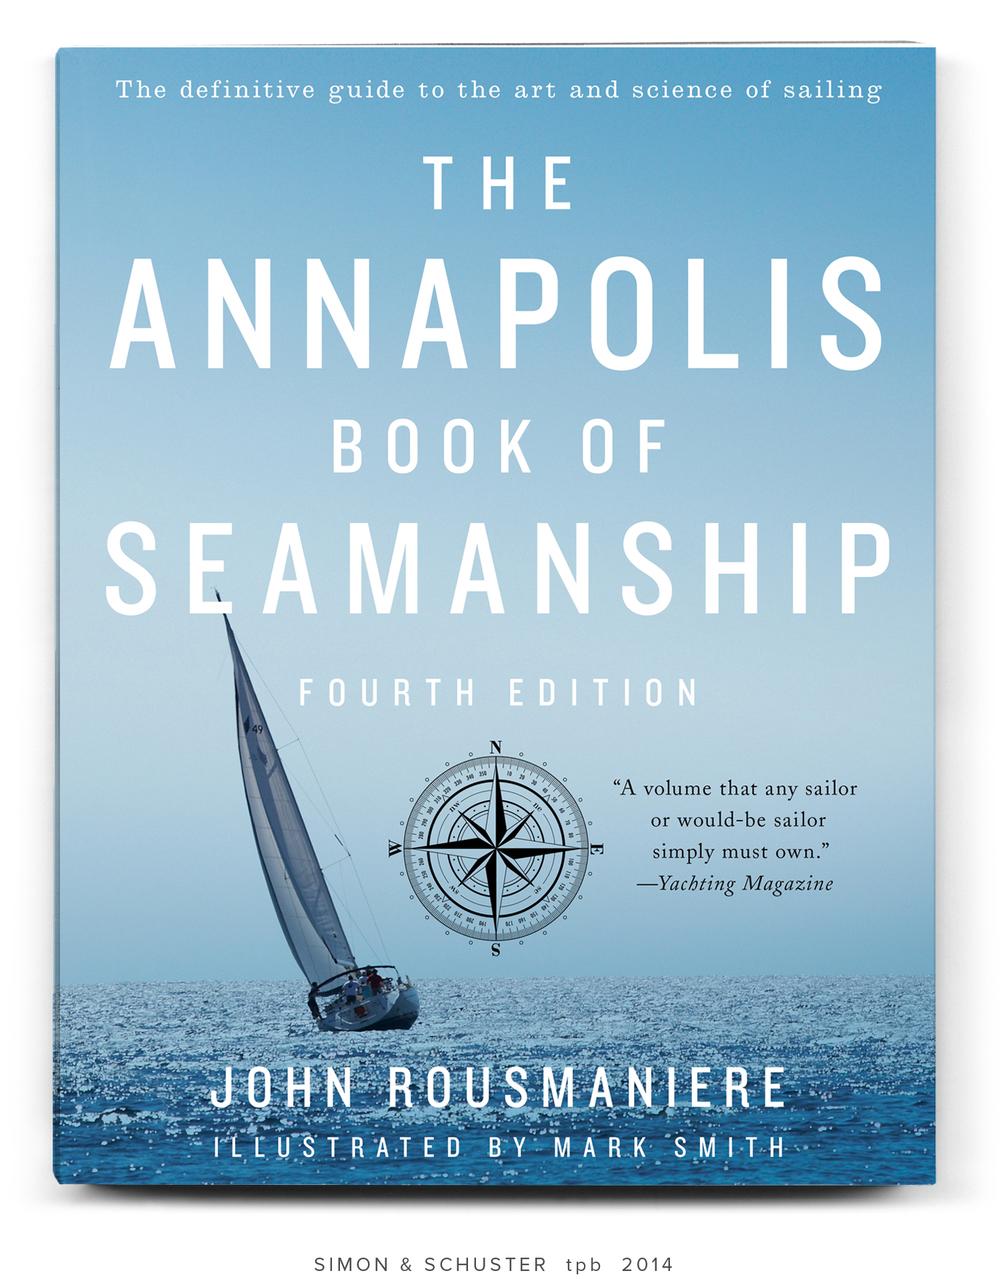 ANNAPOLIS-BOOK-OF-SEAMANSHIP-tpb-ss6.jpg